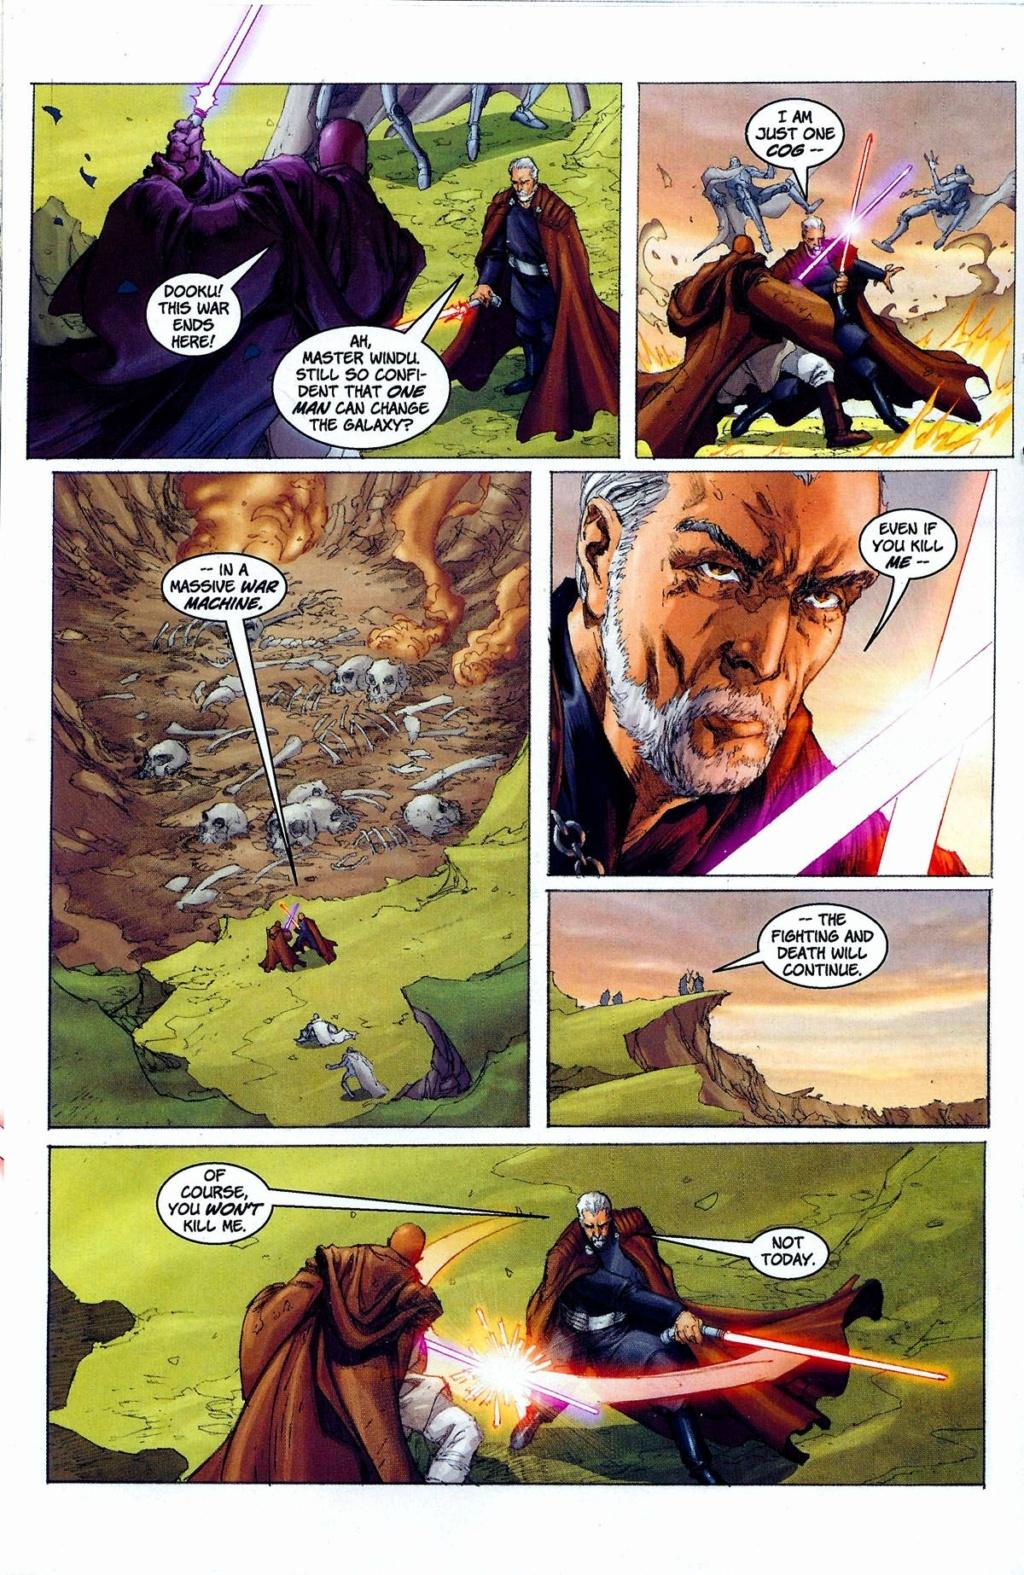 SS - Mace Windu (KnightfallVader / alex s) vs Darth Tyranus (Darth Dorin's Baneling)  A9613811